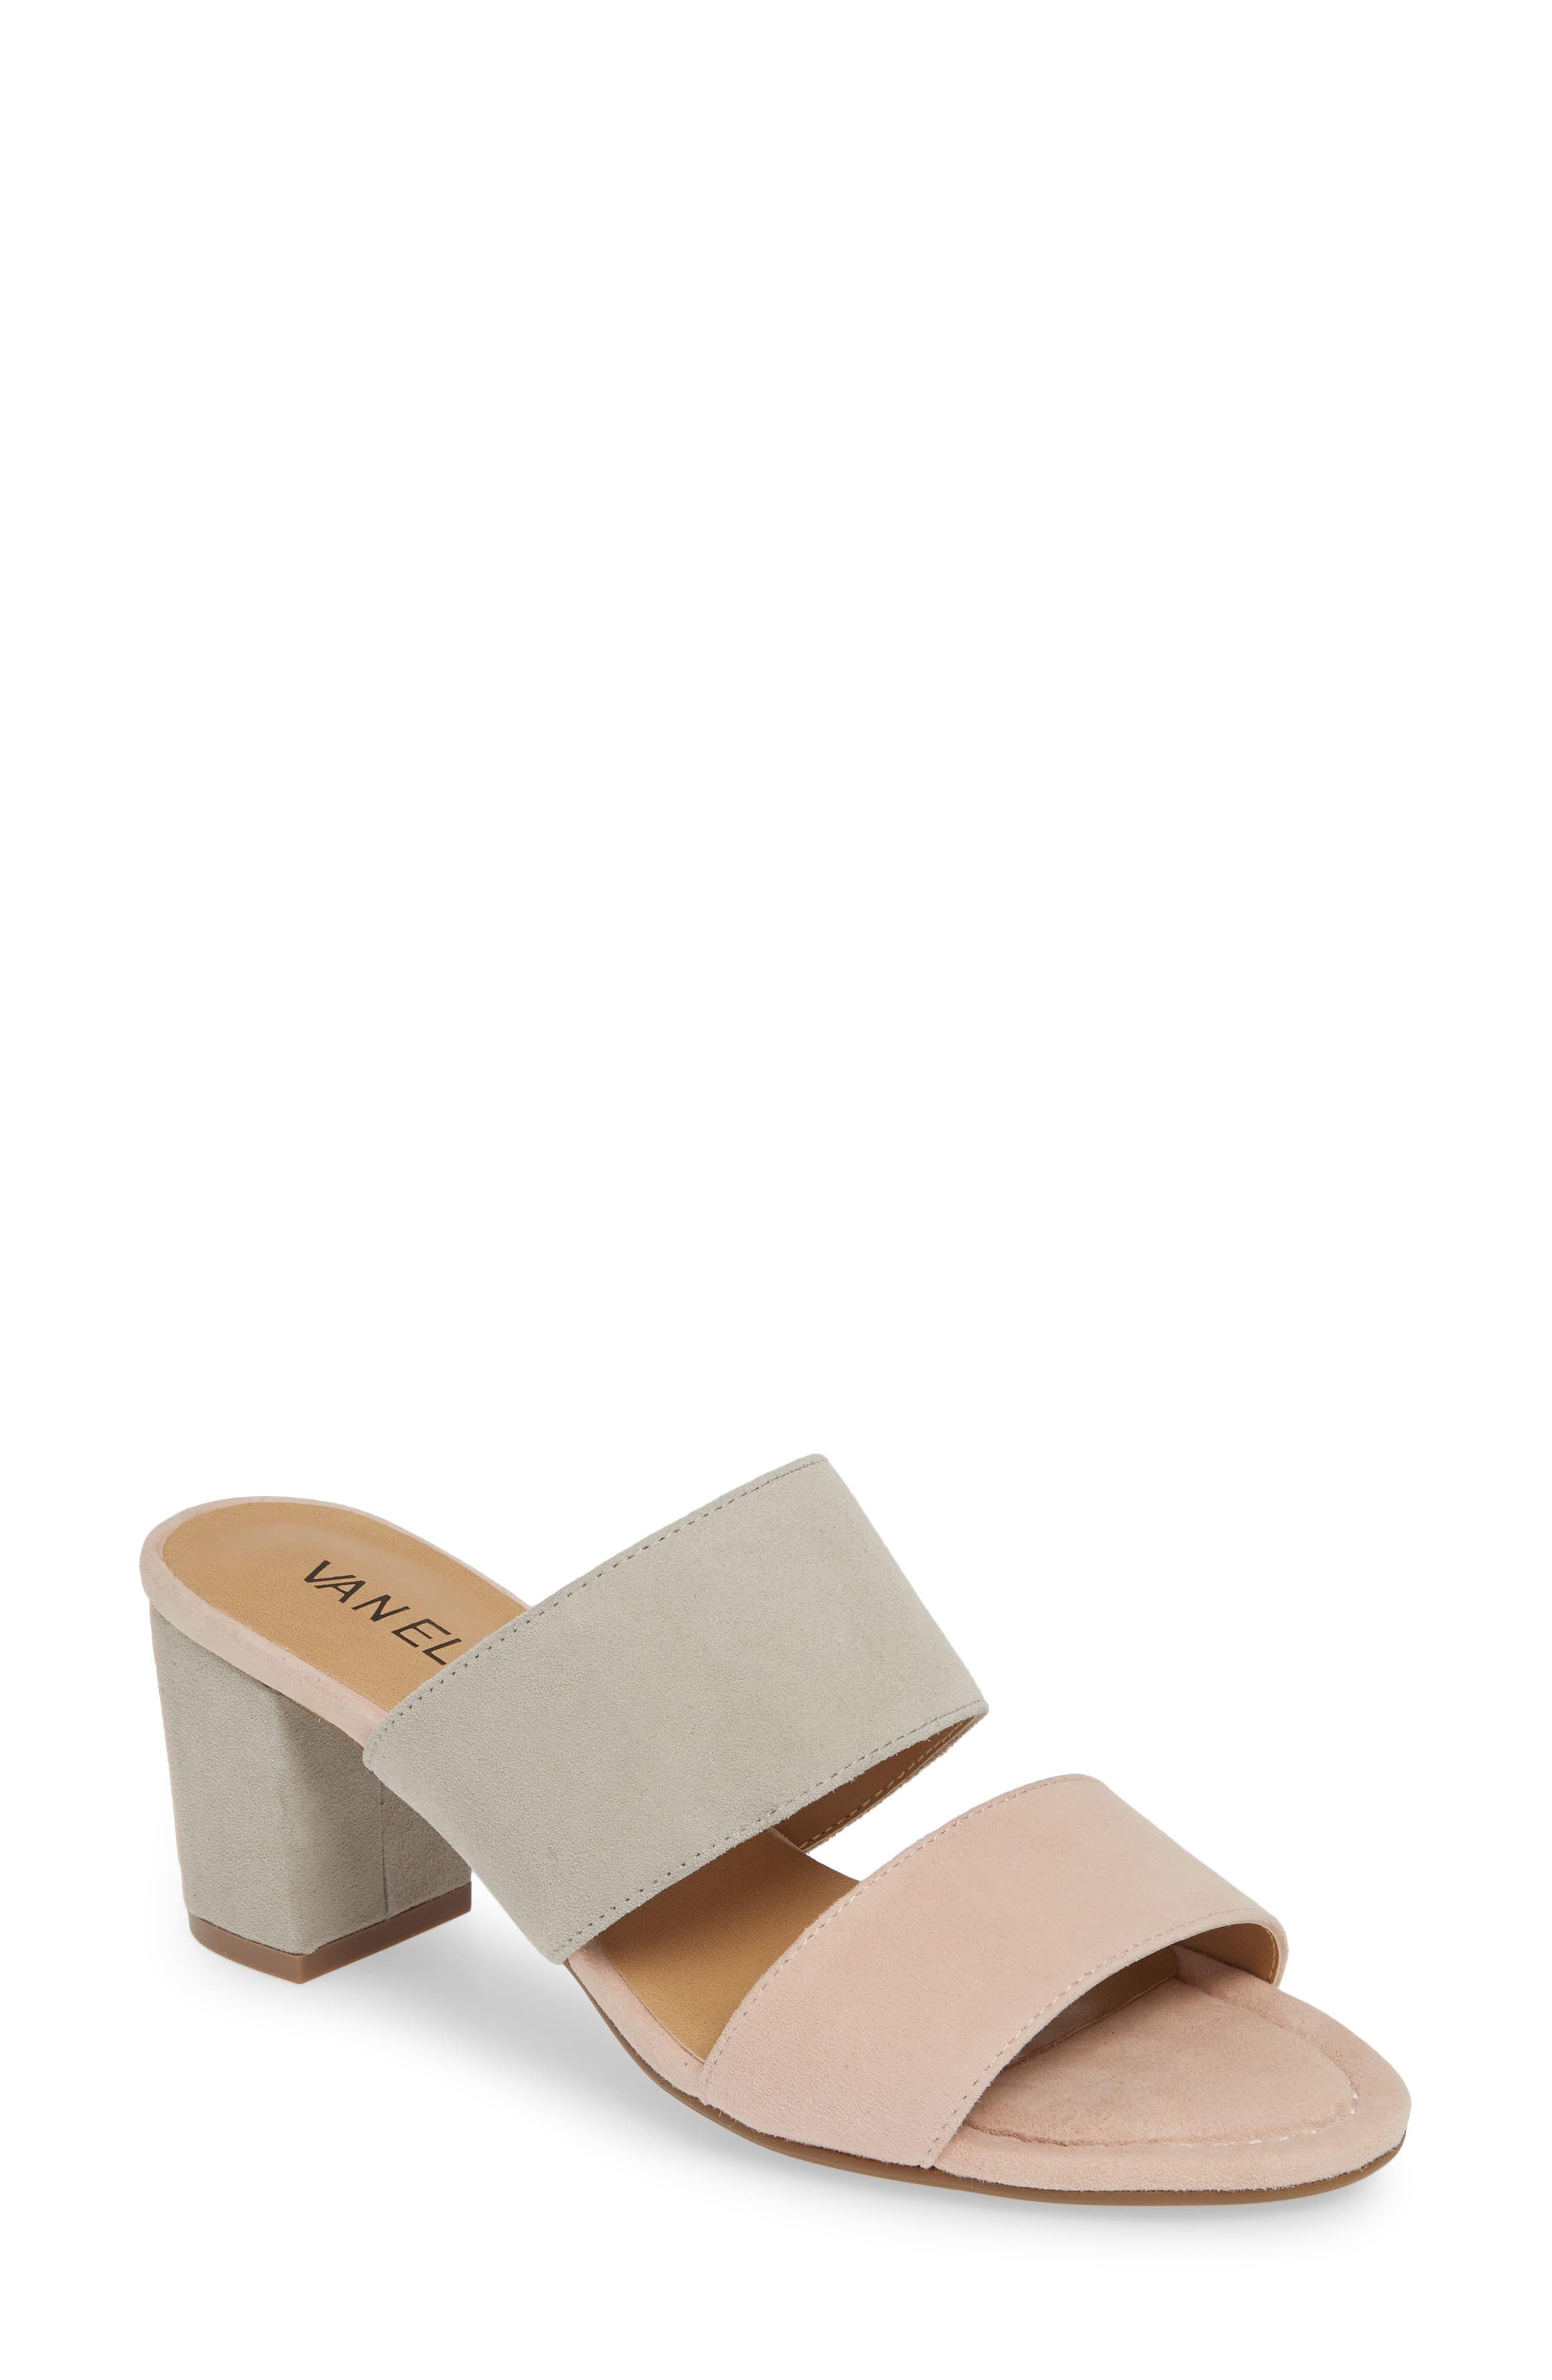 edff06509 Women's Vaneli Matida Slide Sandal, Size 9 M - Beige   Products in ...